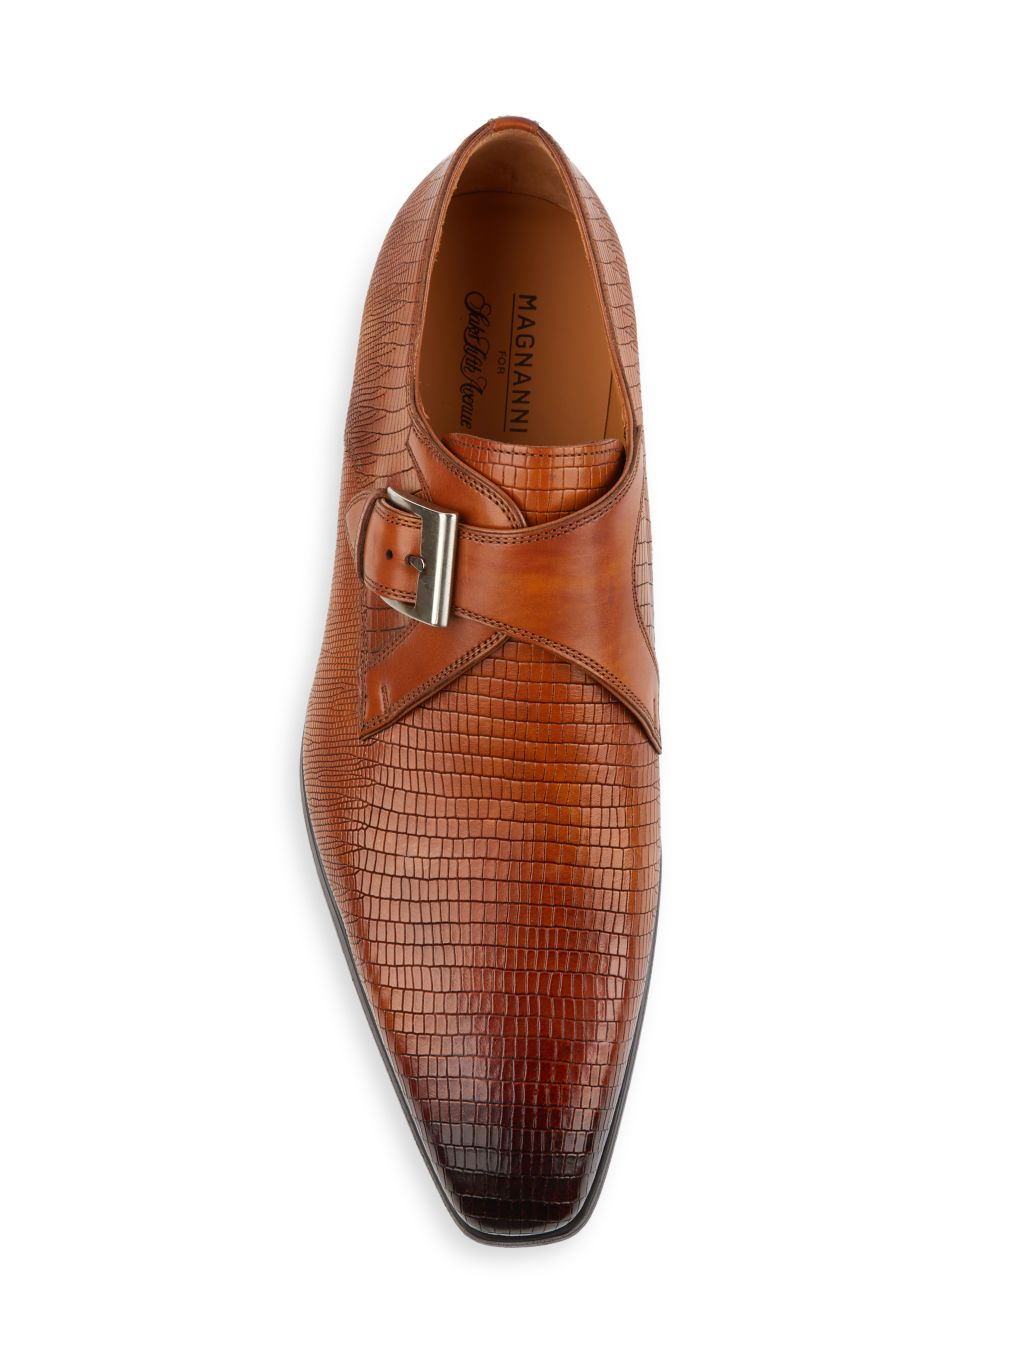 Magnanni Cuero Monk-Strap Croc-Embossed Leather Derbys